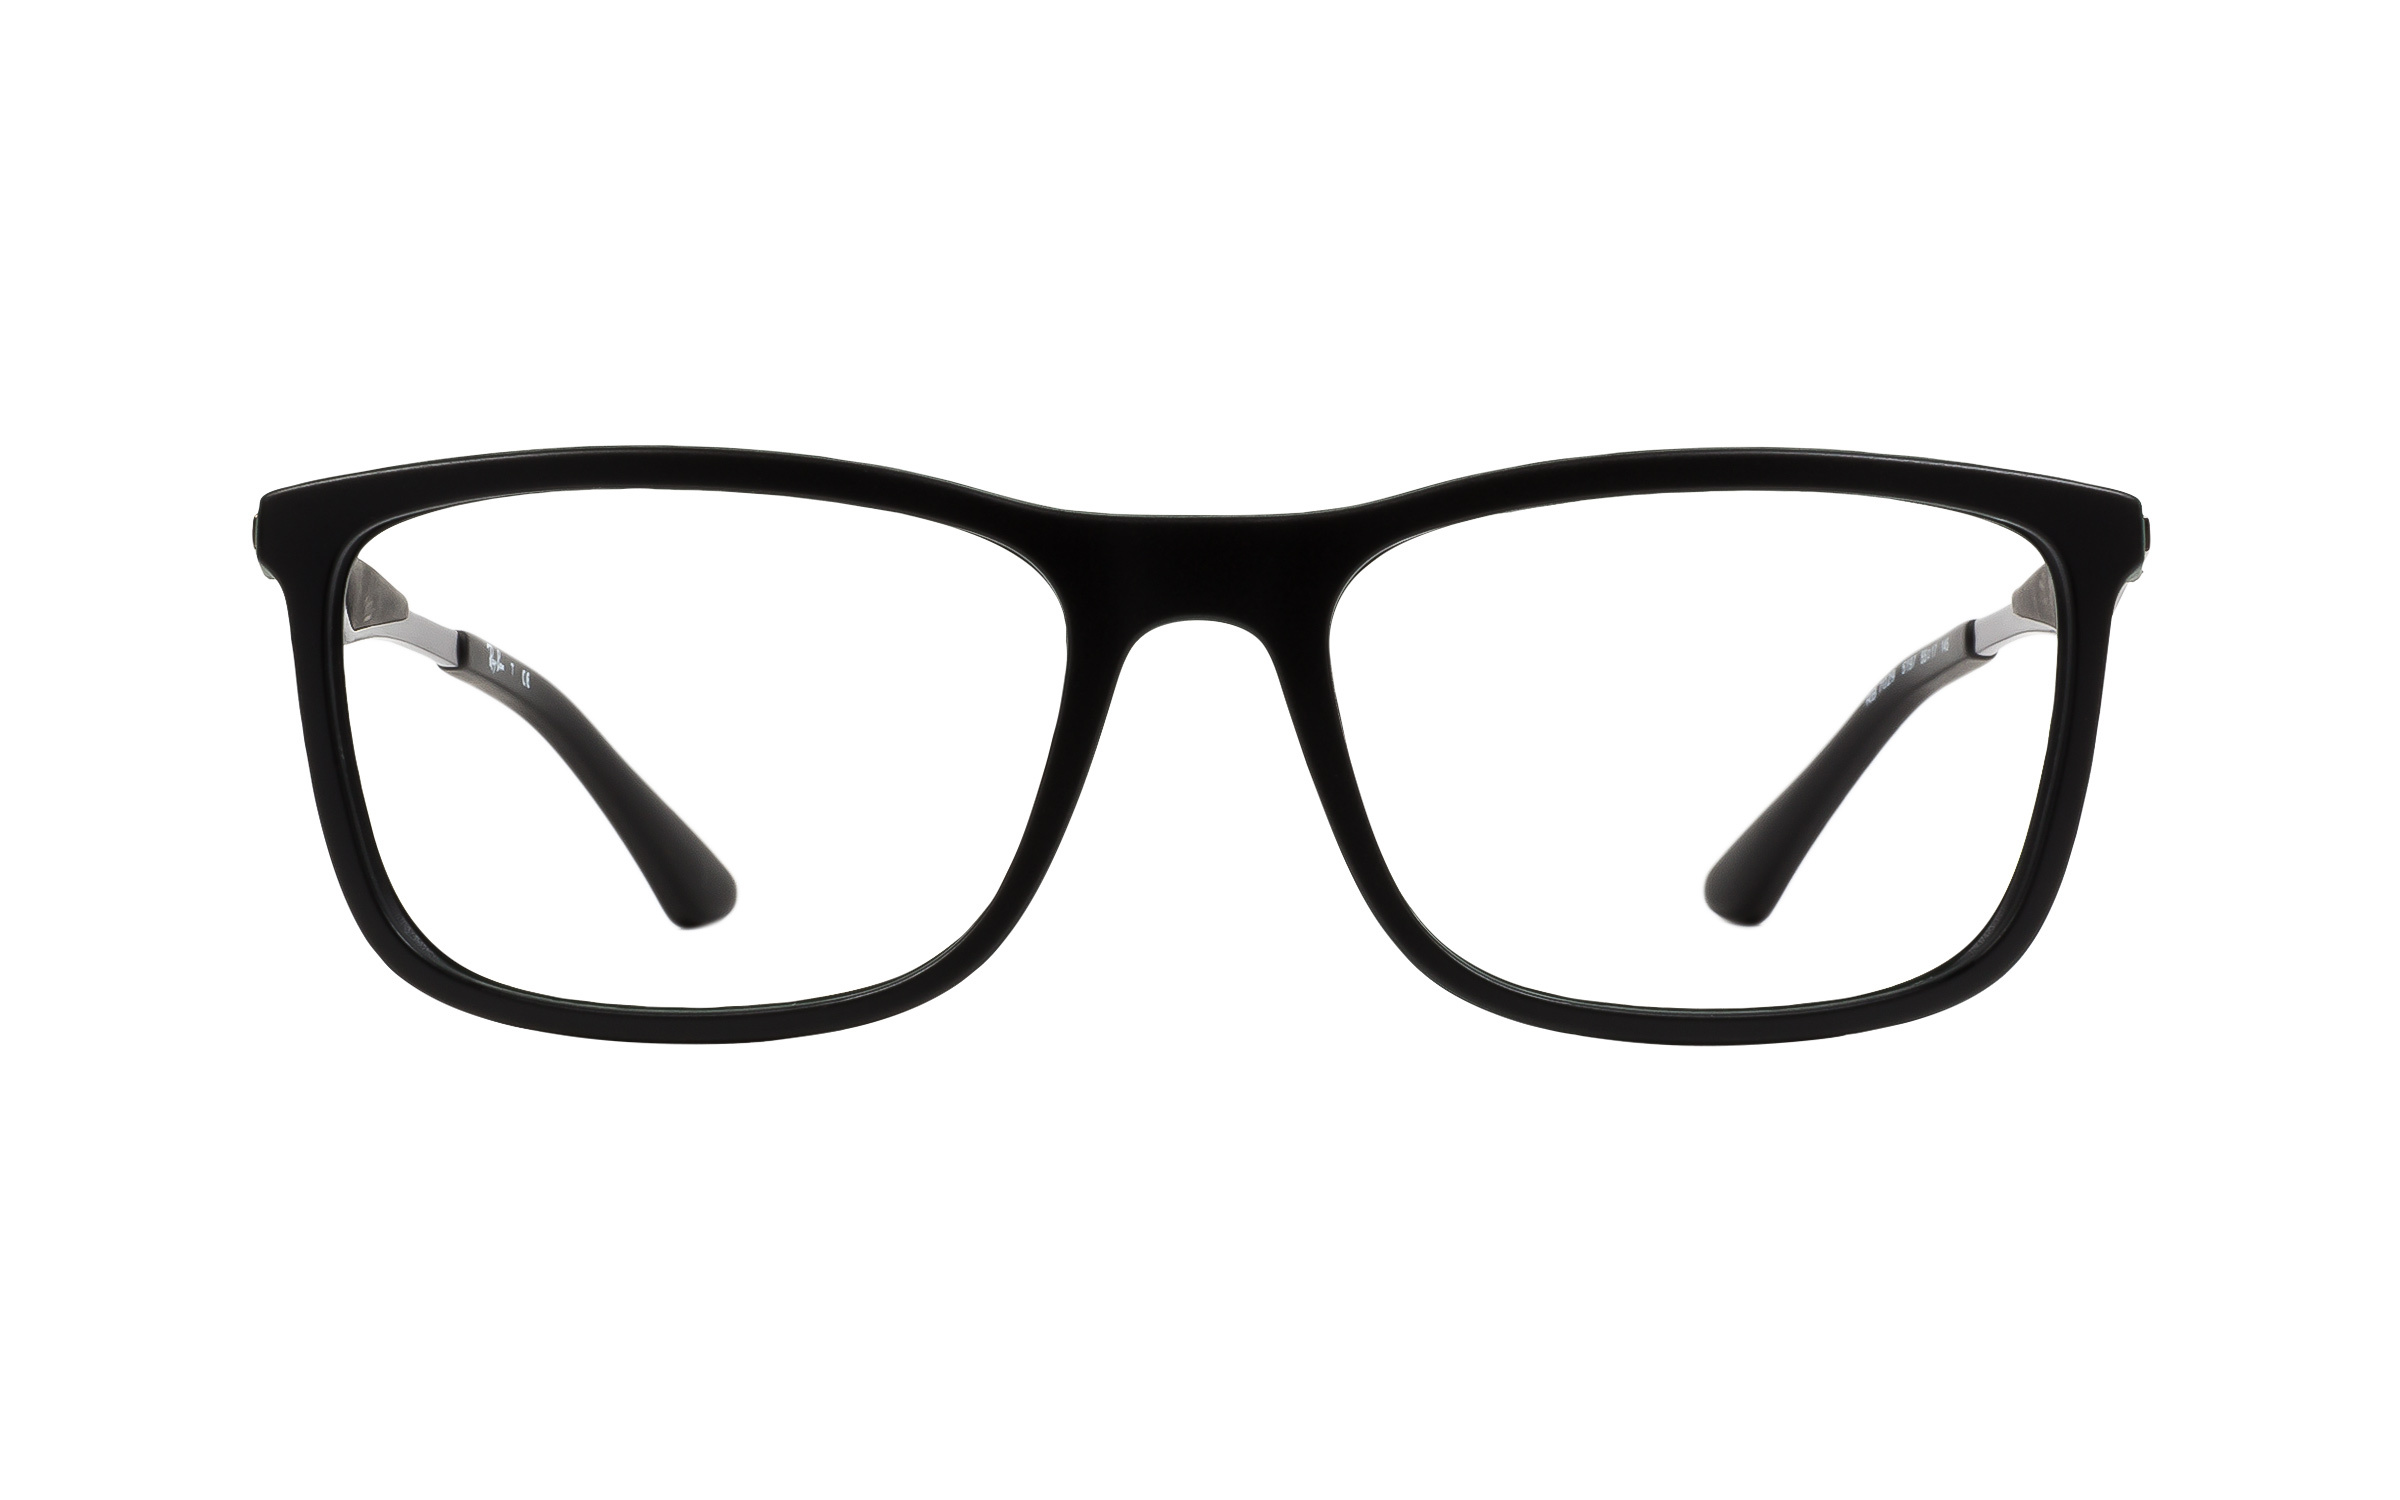 Luxottica Ray-Ban Wayfarer RB7029 5197 Eyeglasses and Frame in Black/Green - Online Coastal